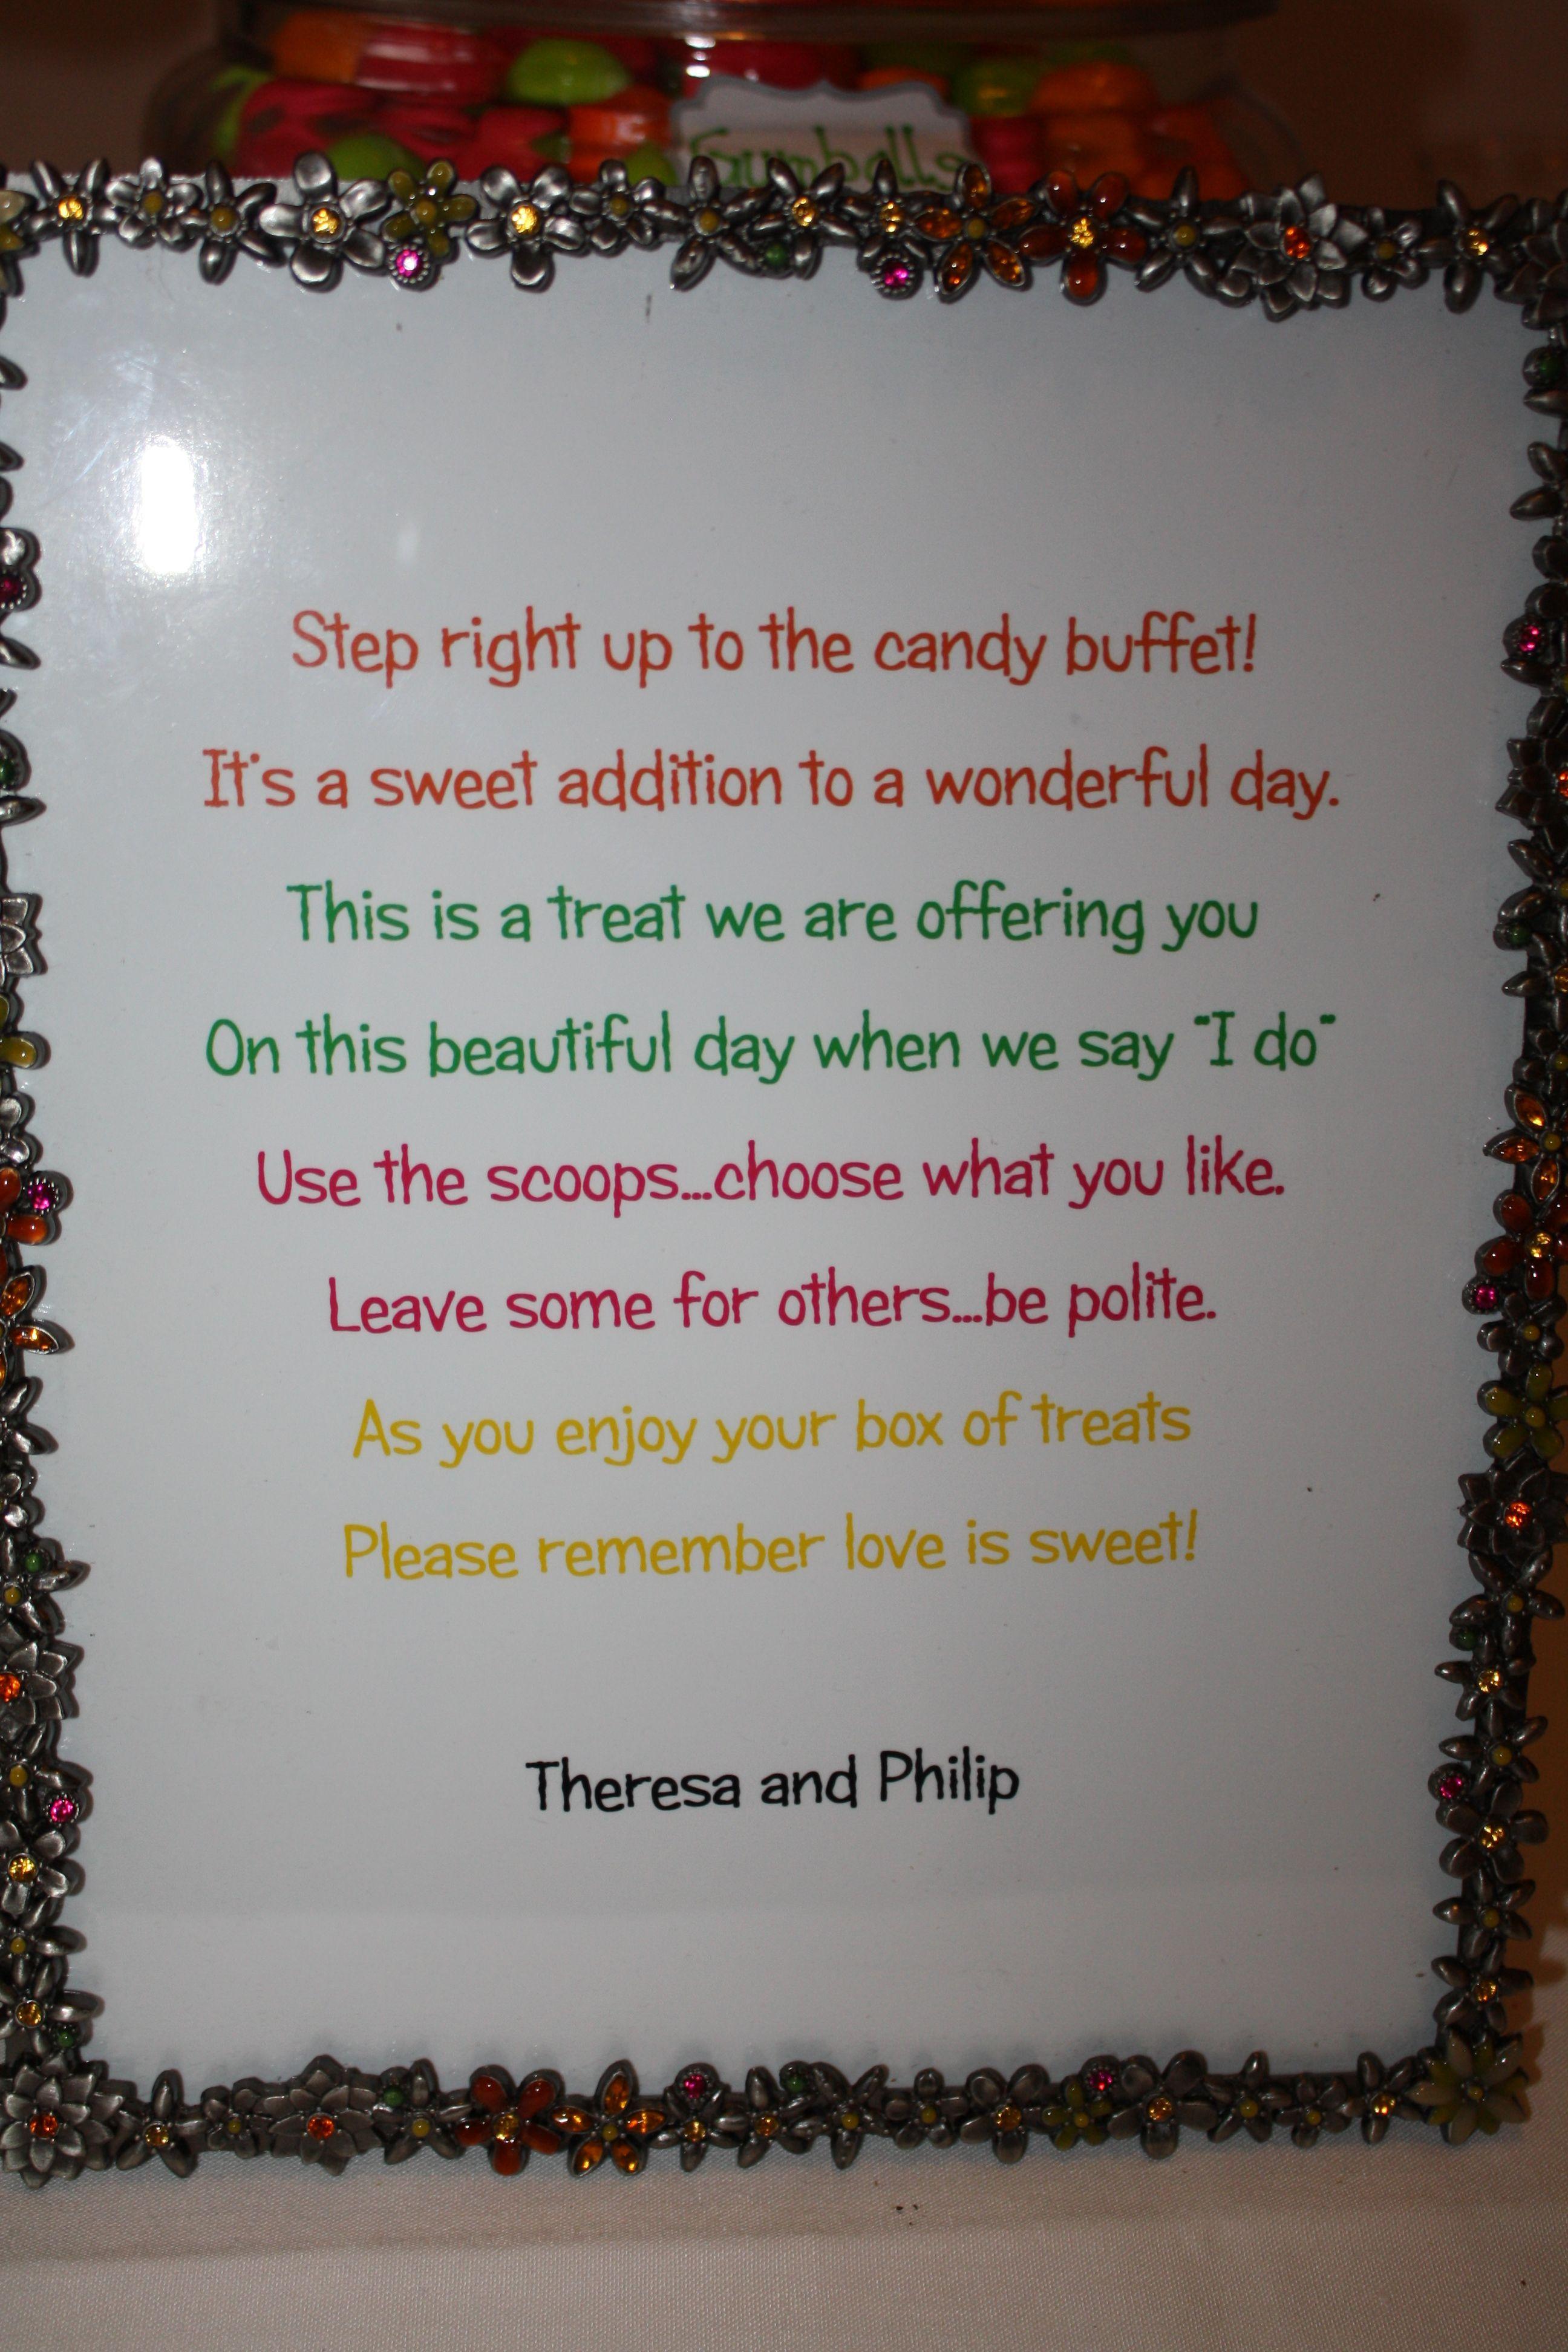 Cute Wording Idea For A Wedding Candy Buffet Candy Buffet Ideas Wedding Candy Wedding With